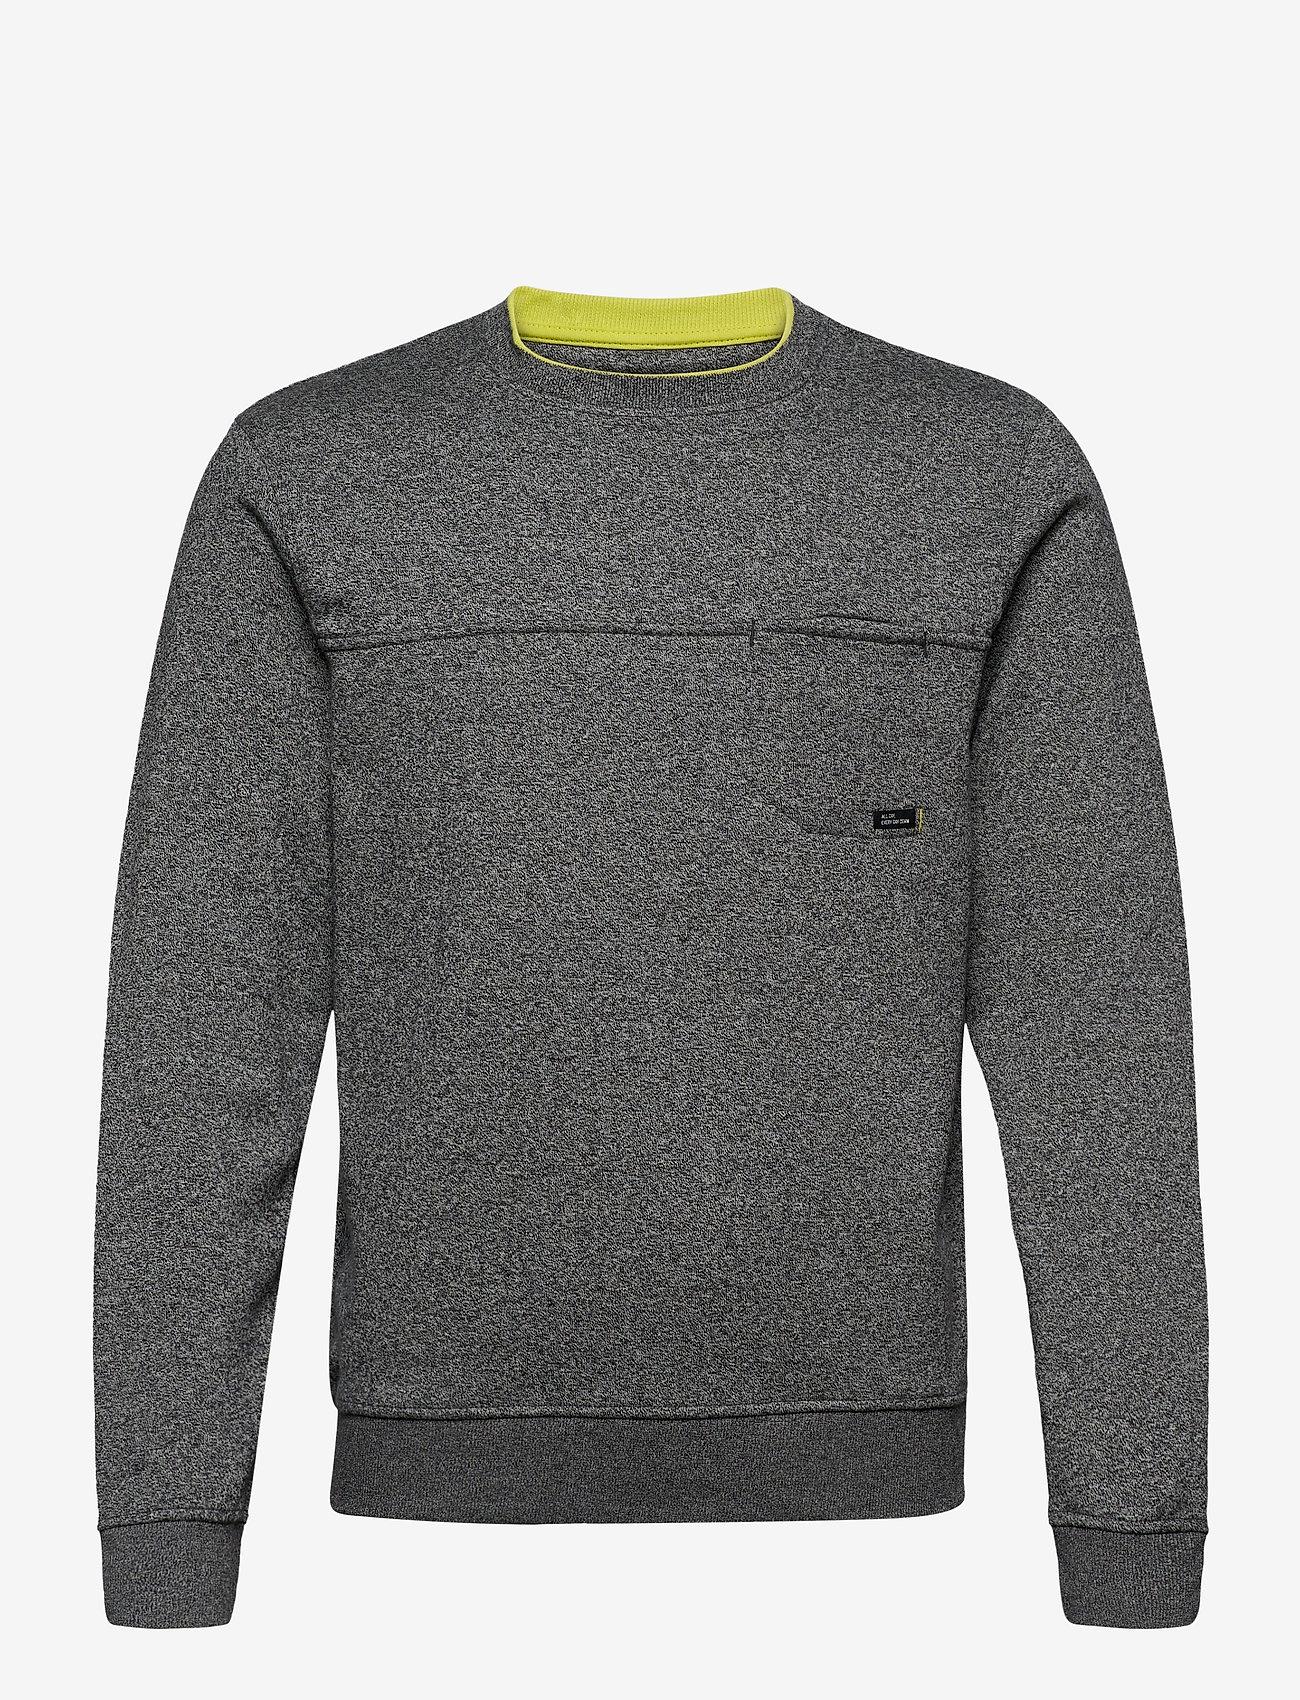 Blend - Sweatshirt - basic sweatshirts - charcoal mix - 0